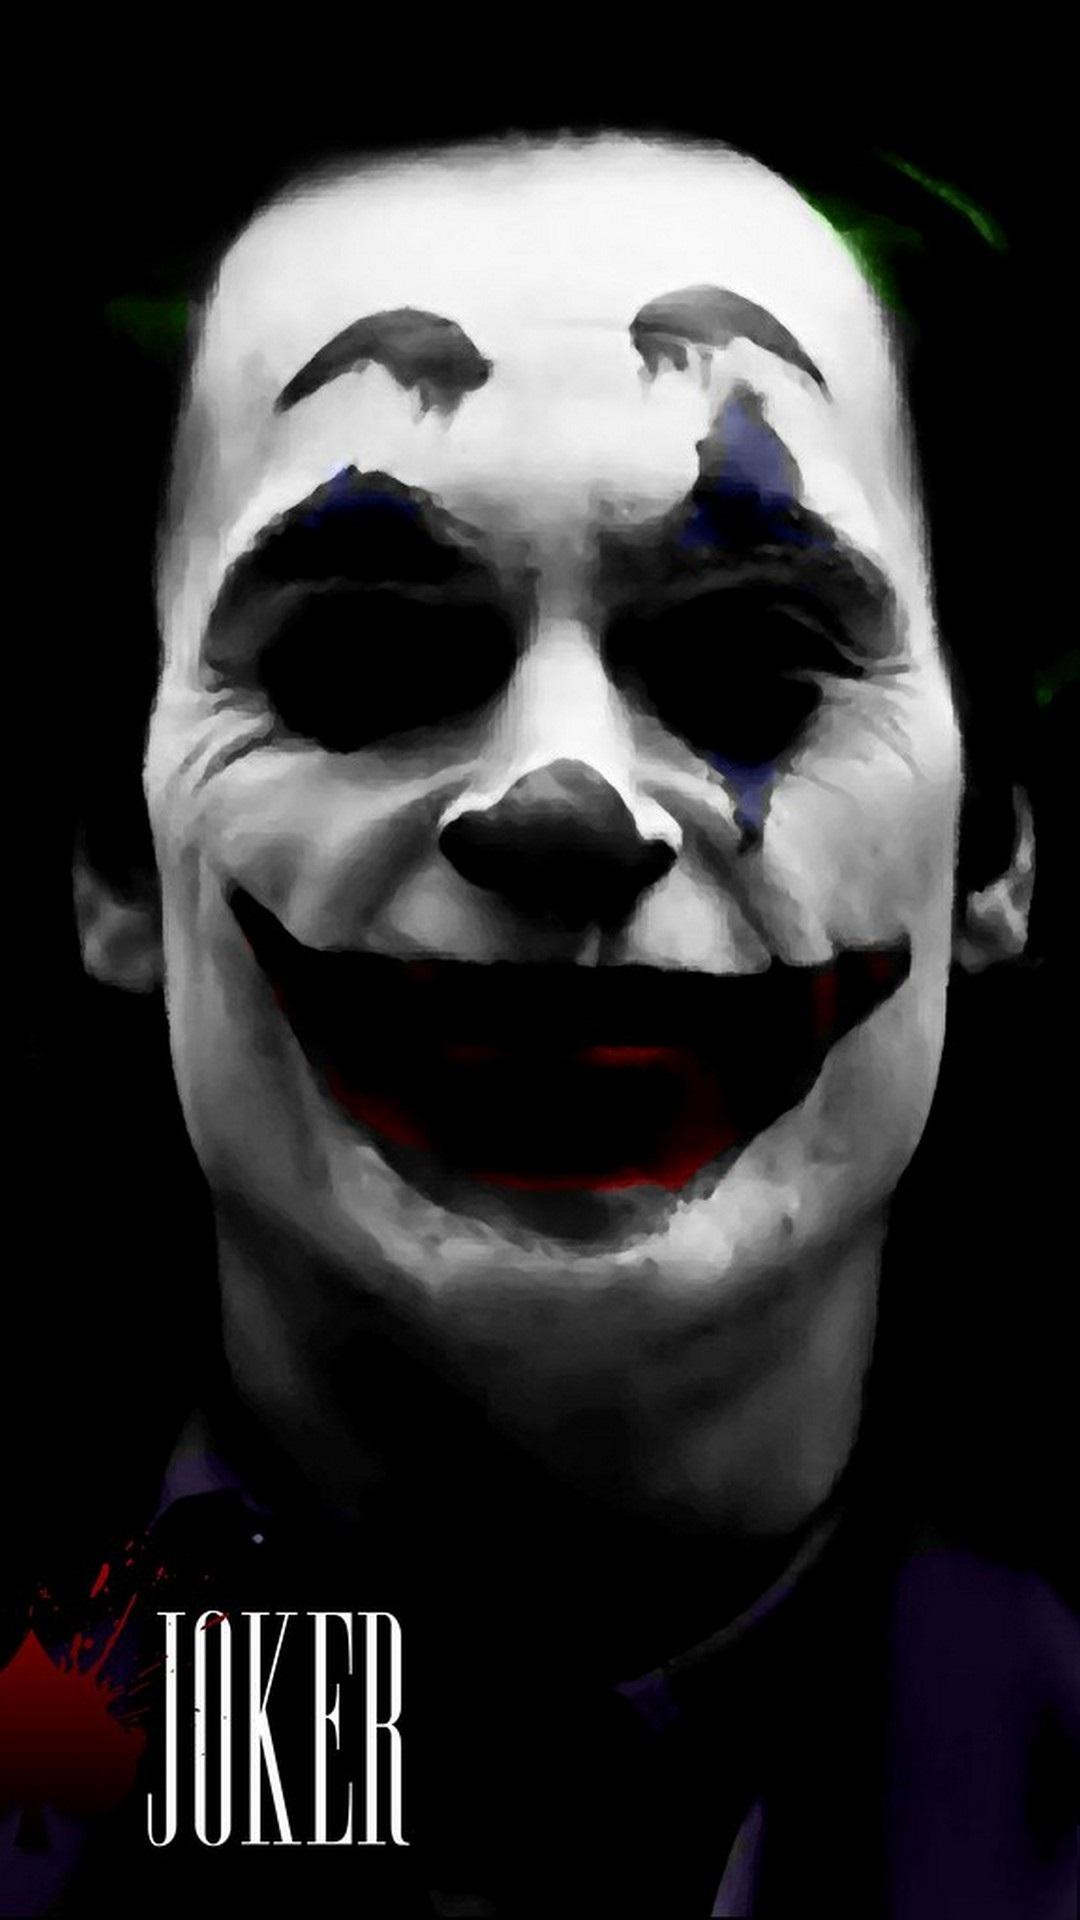 Joker Mobile Wallpaper Posted By Sarah Cunningham